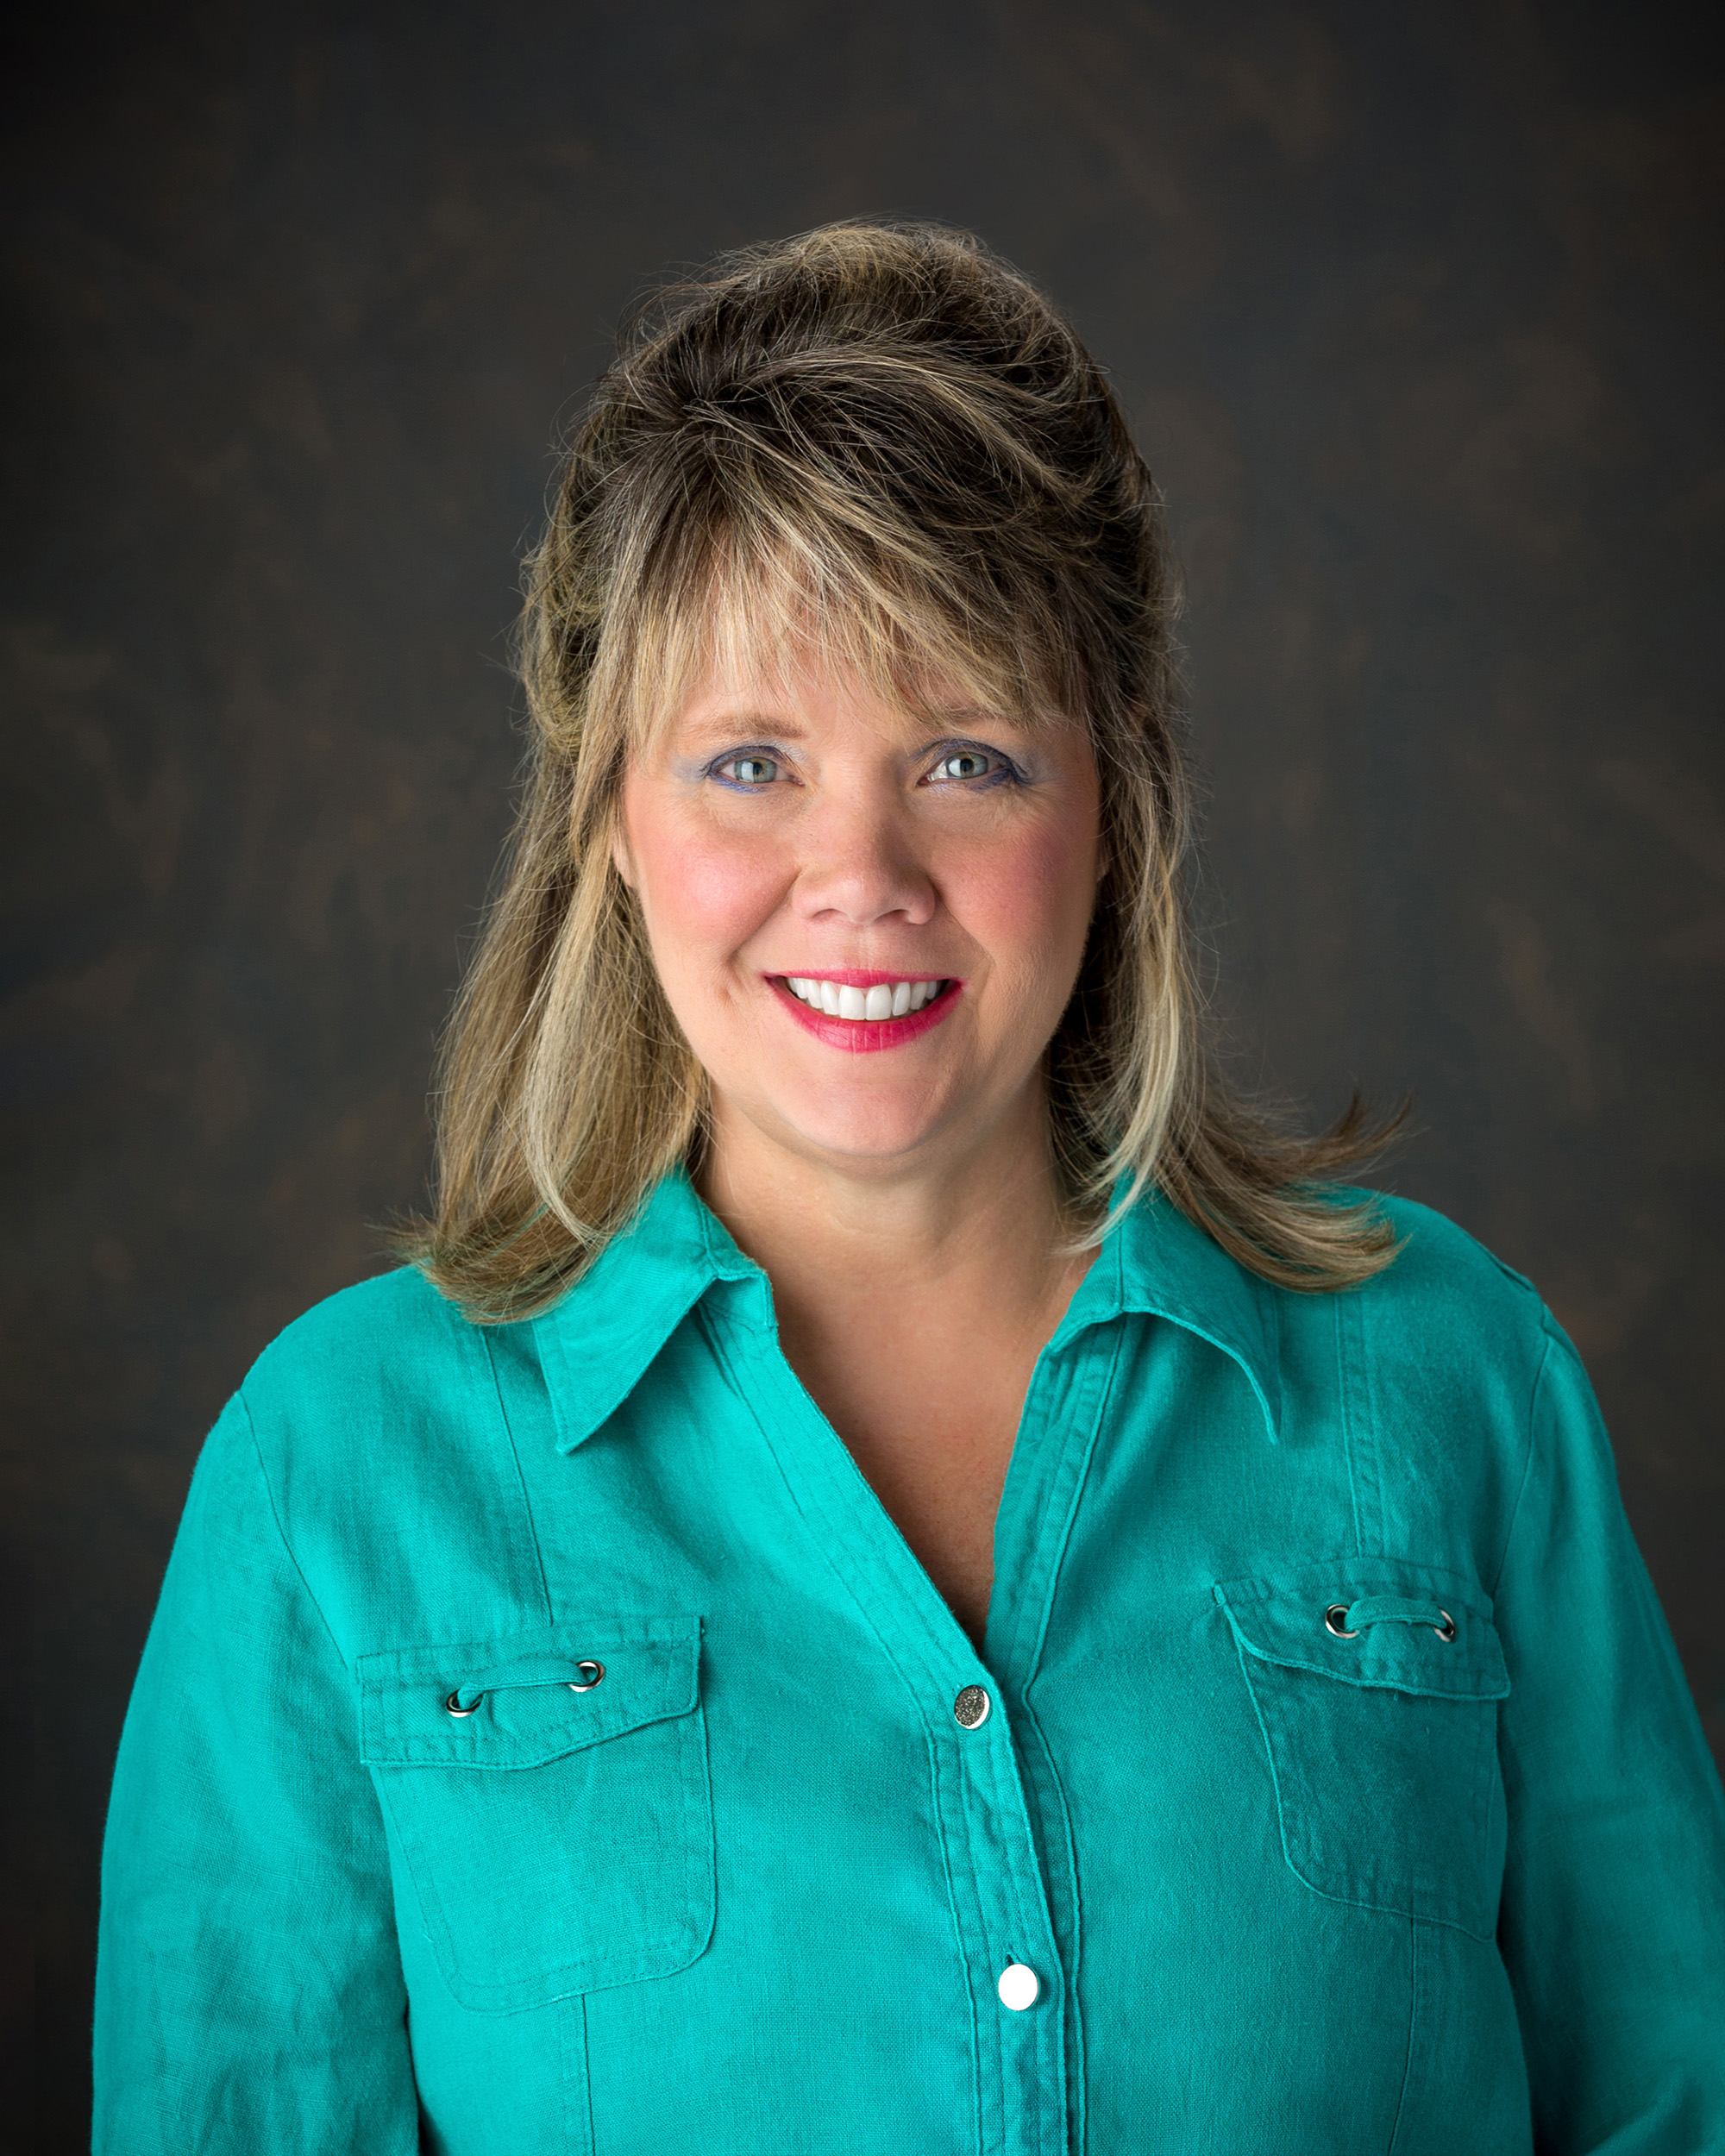 Tina Stewart